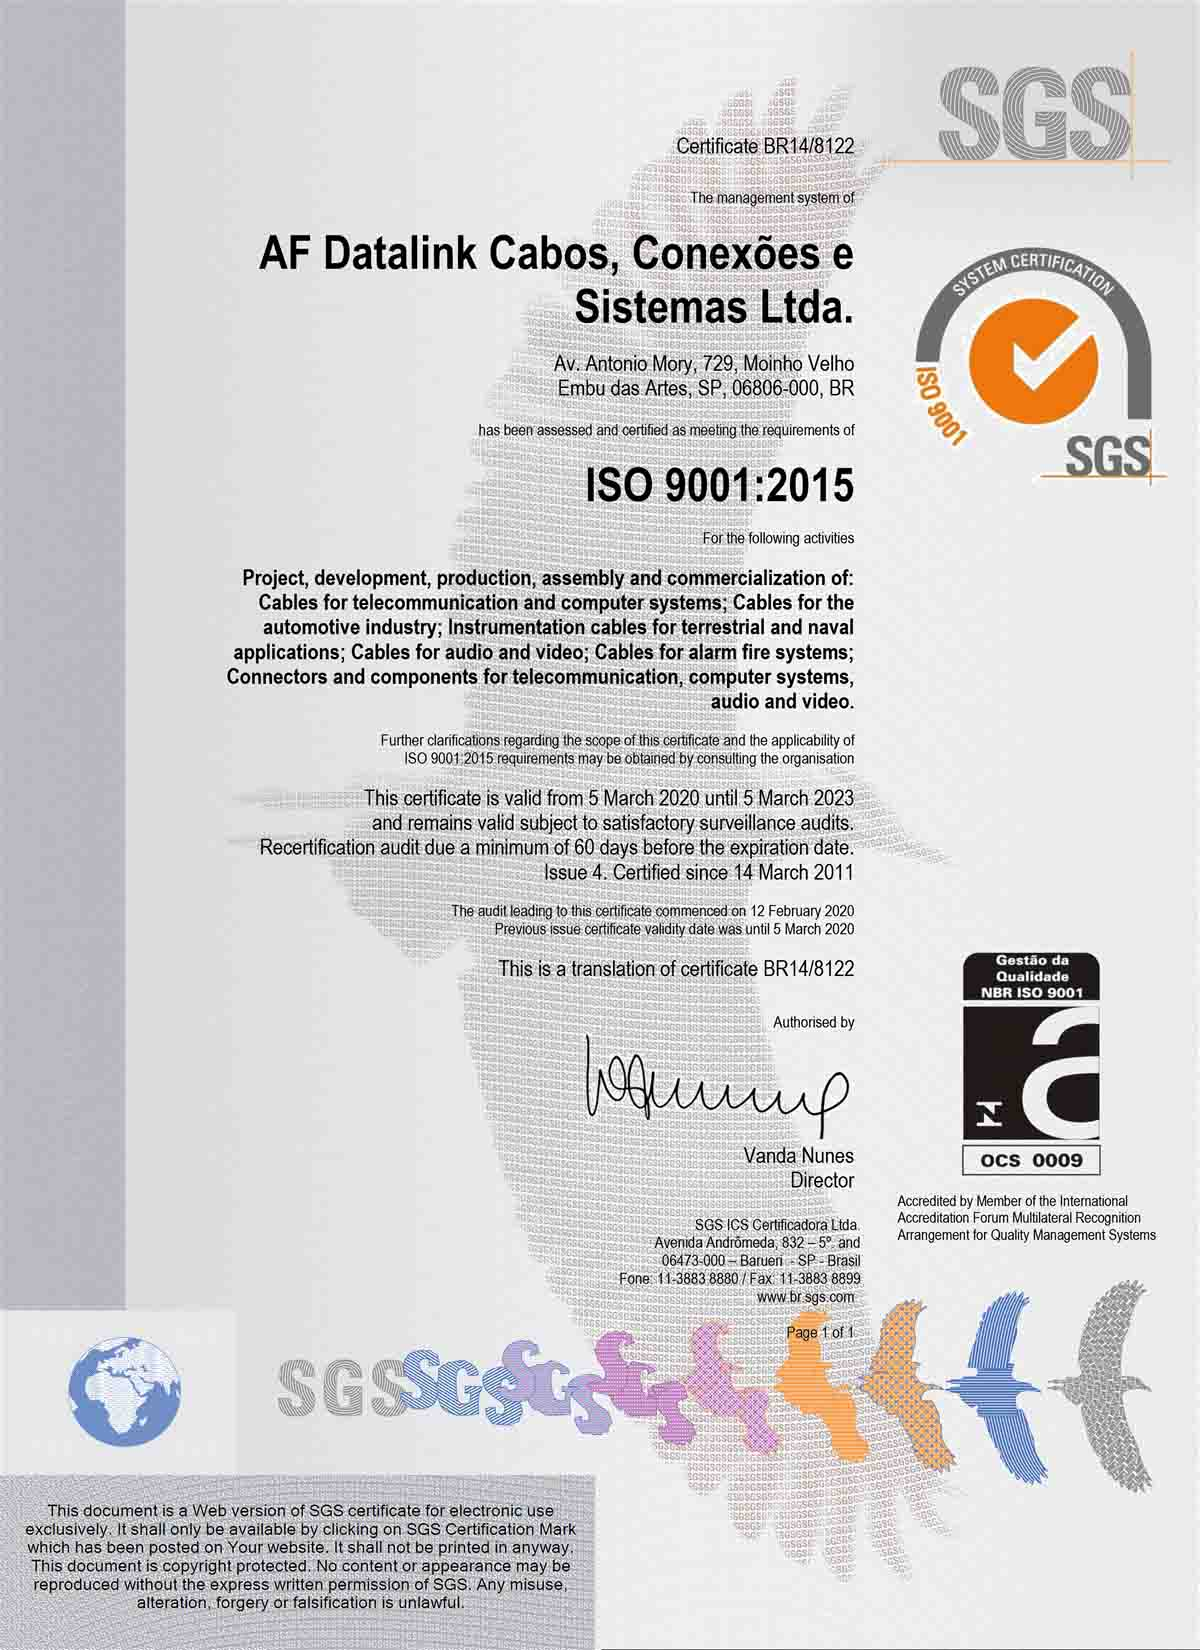 Certificado-ISO9001-2015-ENG.jpg?time=1601165645